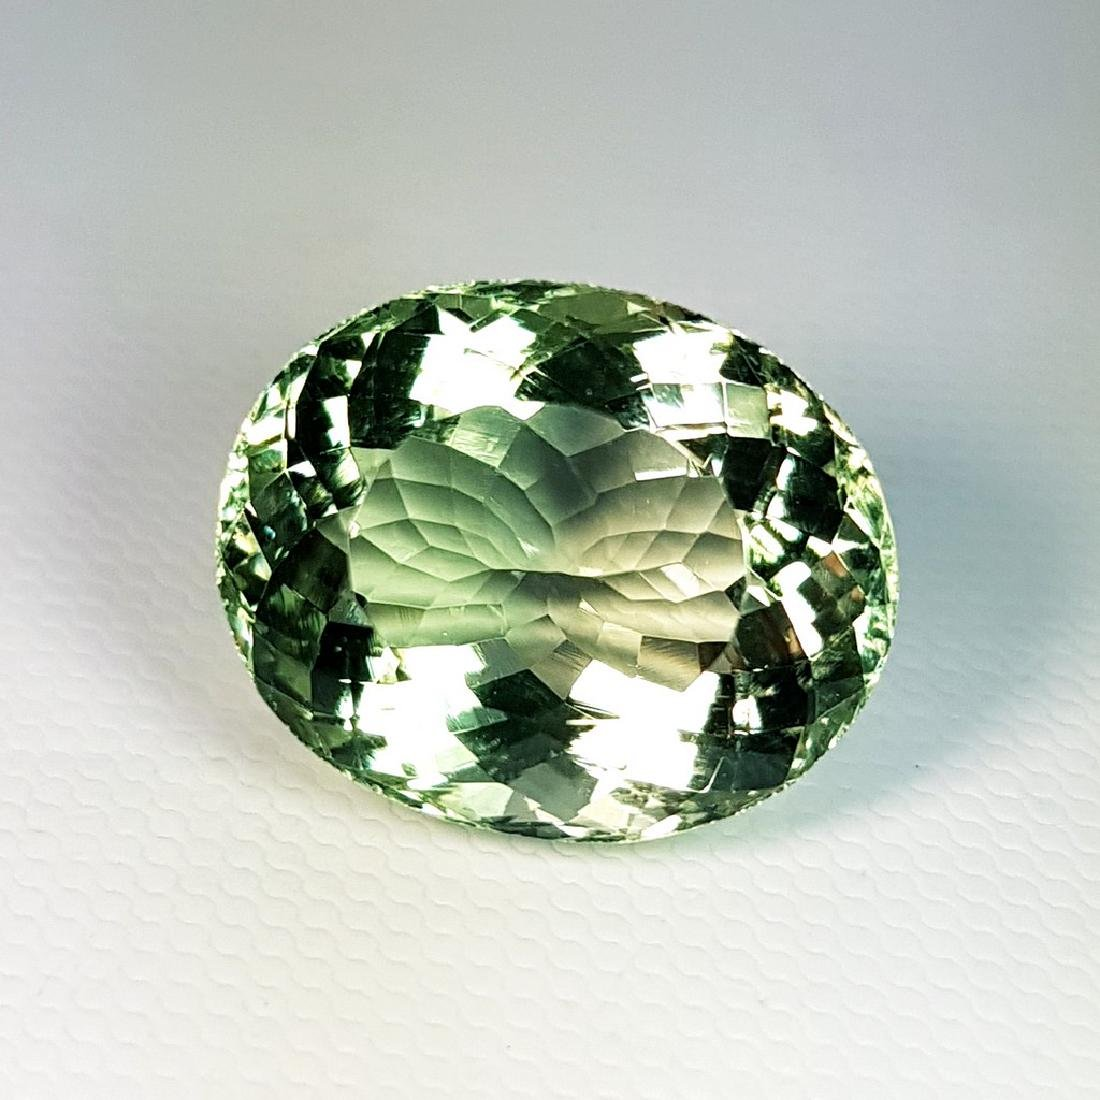 Green Amethyst - 19.22 ct - 2